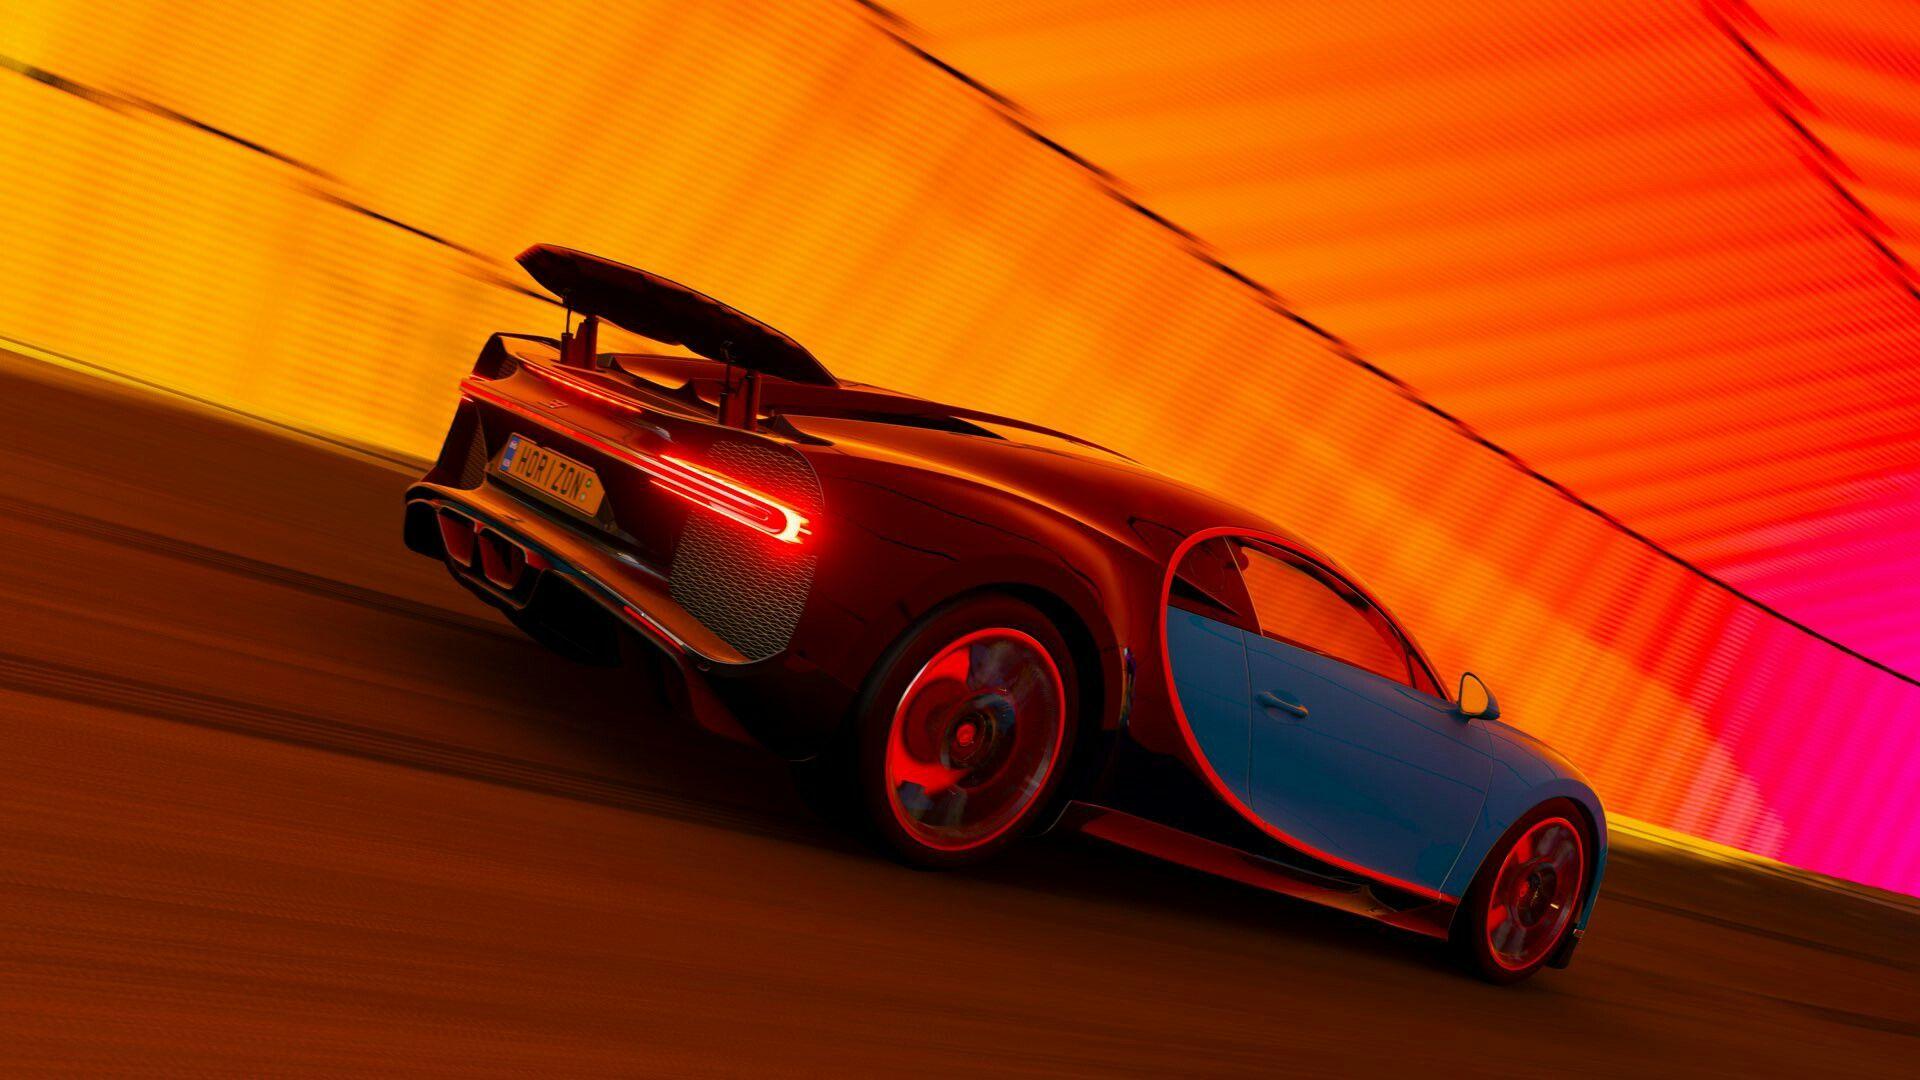 Bugatti Chiron Forza Horizon 4 Forza Horizon Forza Horizon 4 Forza Motorsport